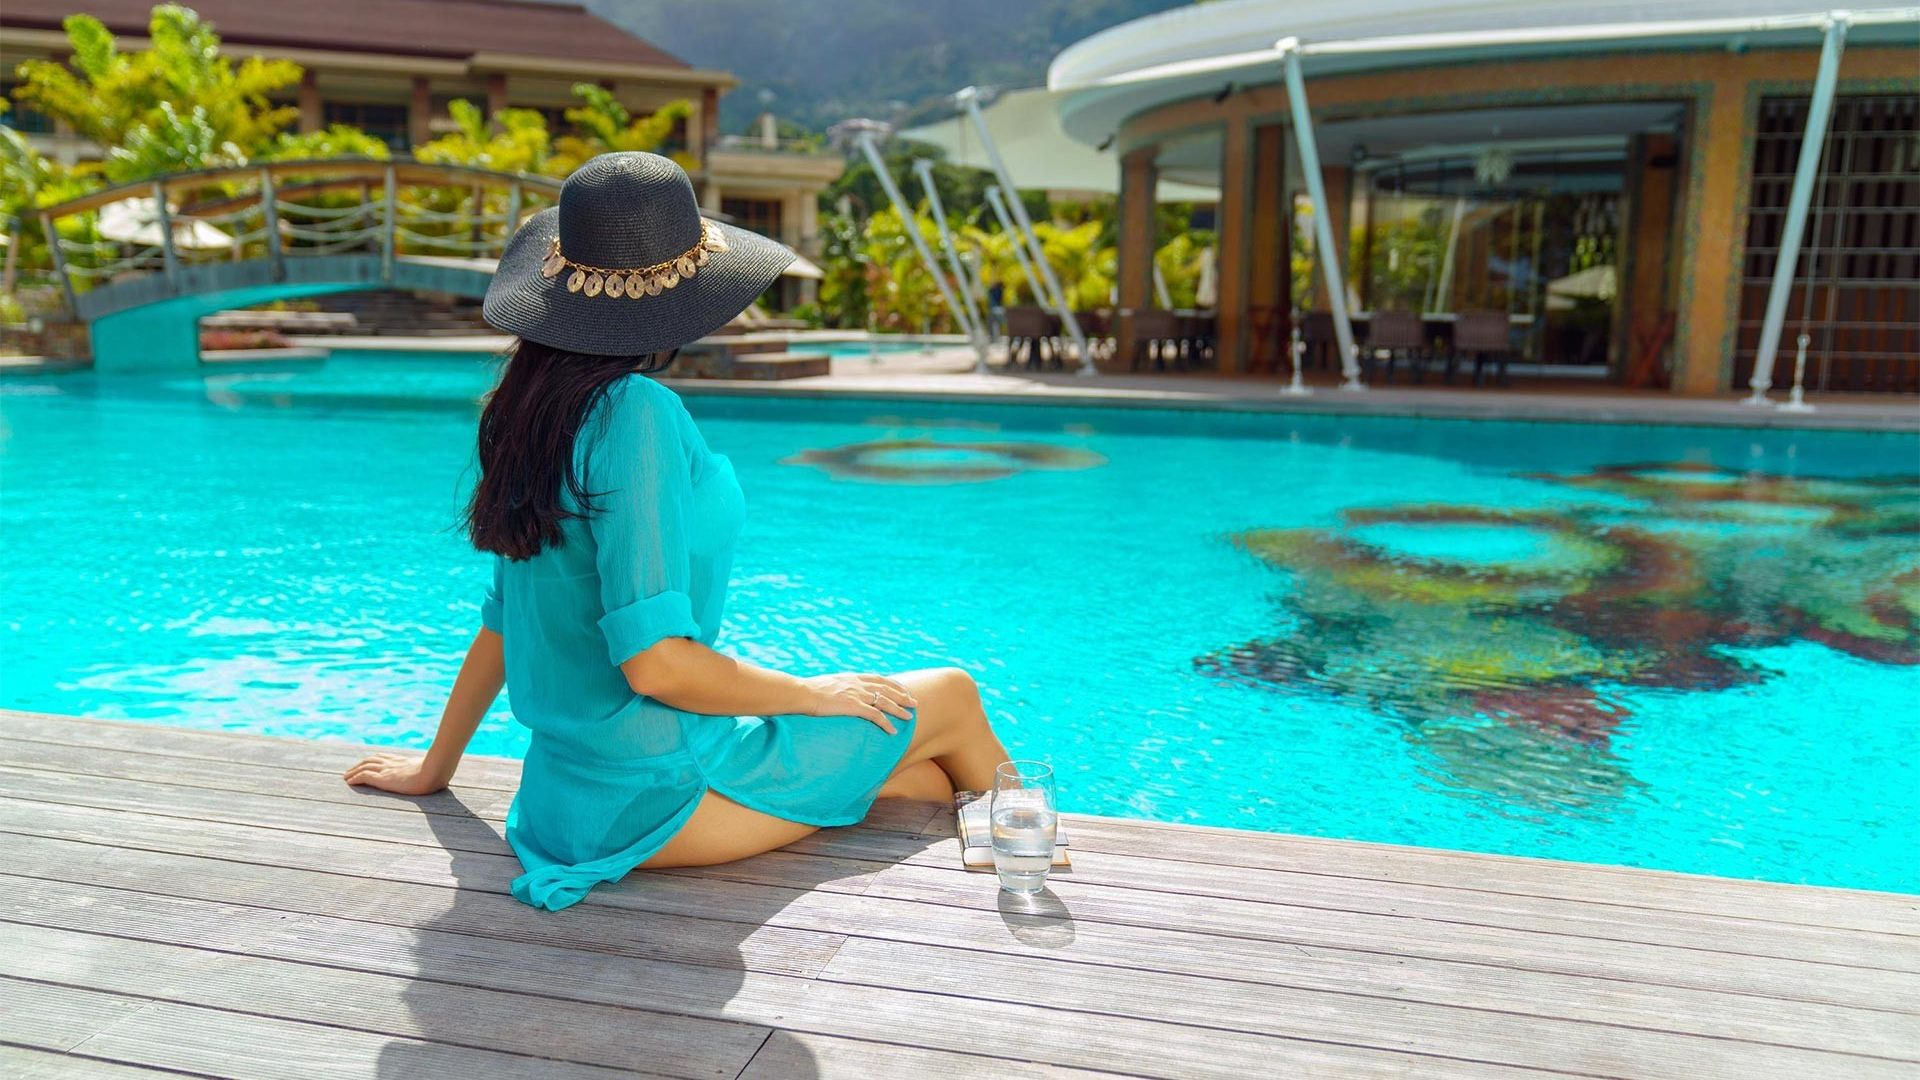 Luna de miere - Sejur plaja Savoy Resort & Spa 5*, 10 zile